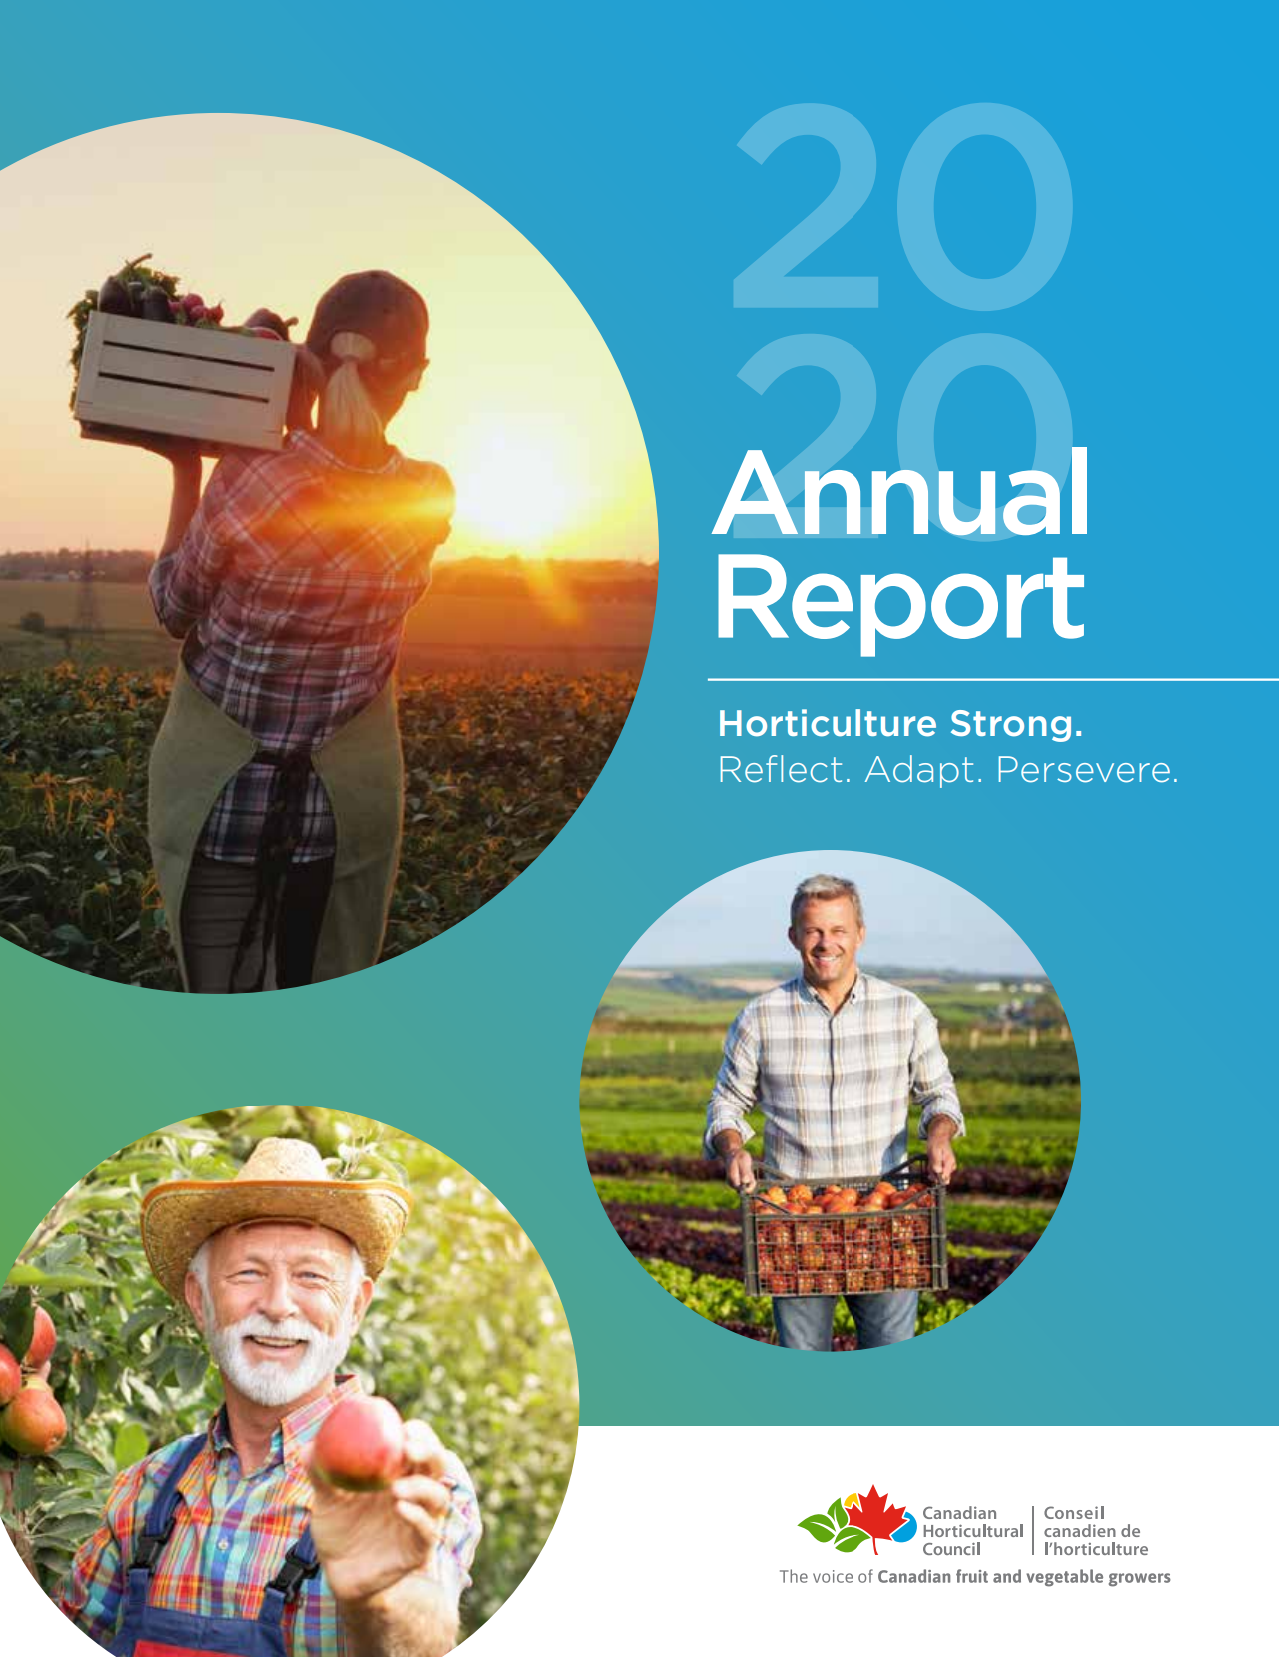 2020-Annual-Report-CHC-ENG-thumbnail